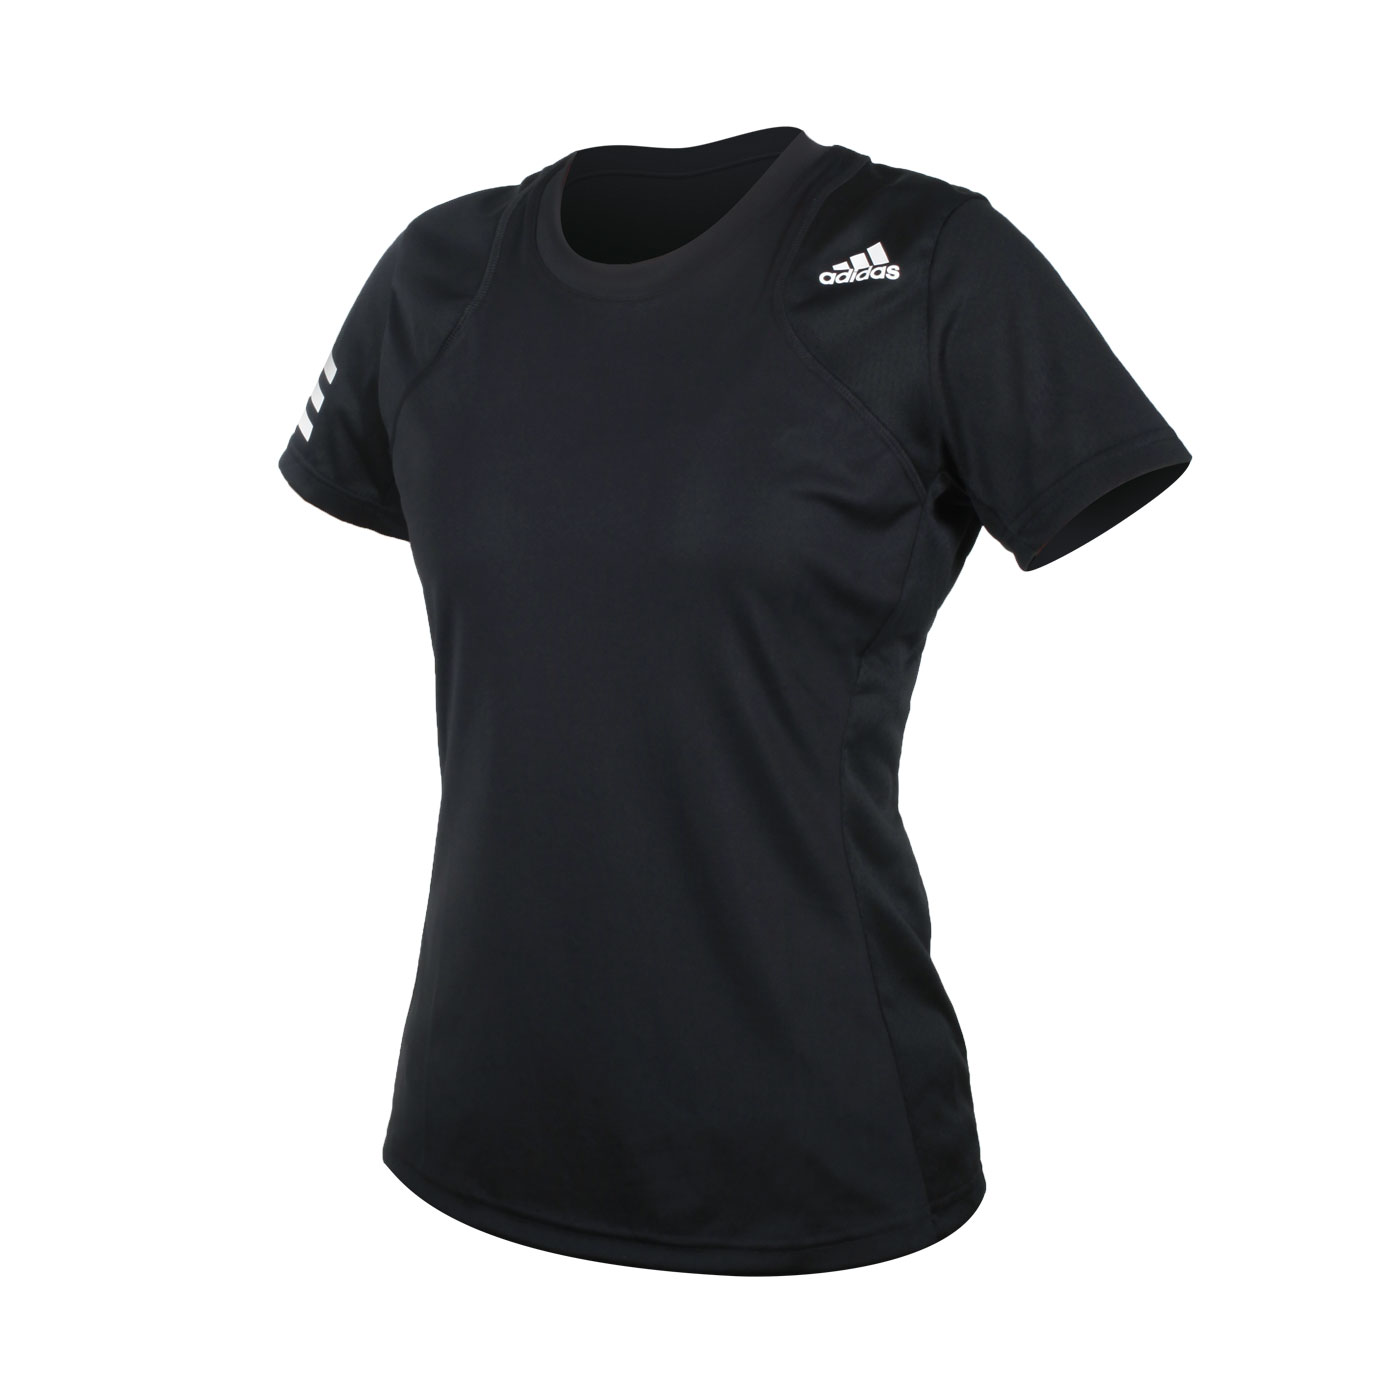 ADIDAS 女款短袖T恤 GL5530 - 黑白